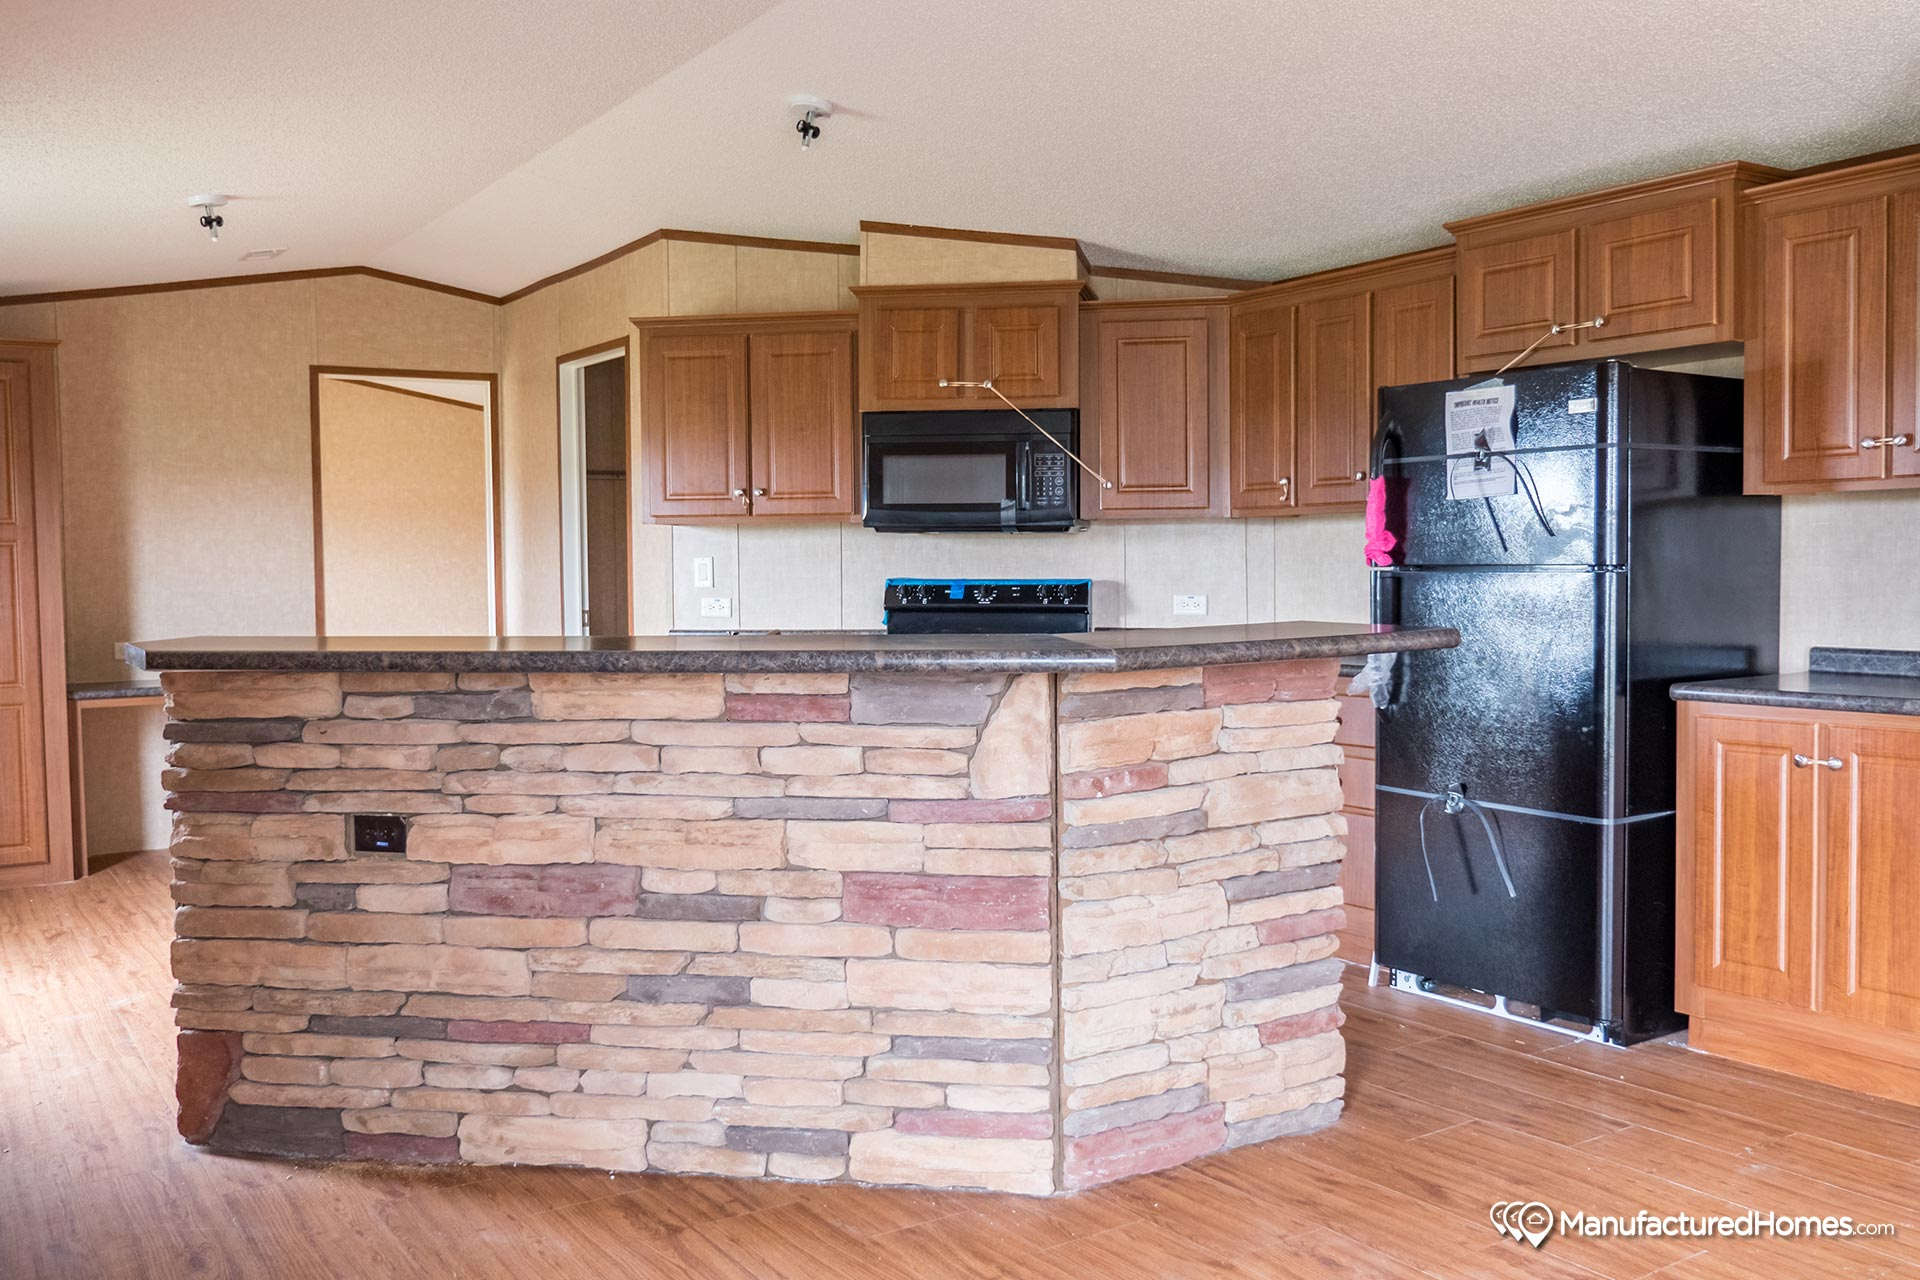 Heritage / 1684-32A - Kitchen